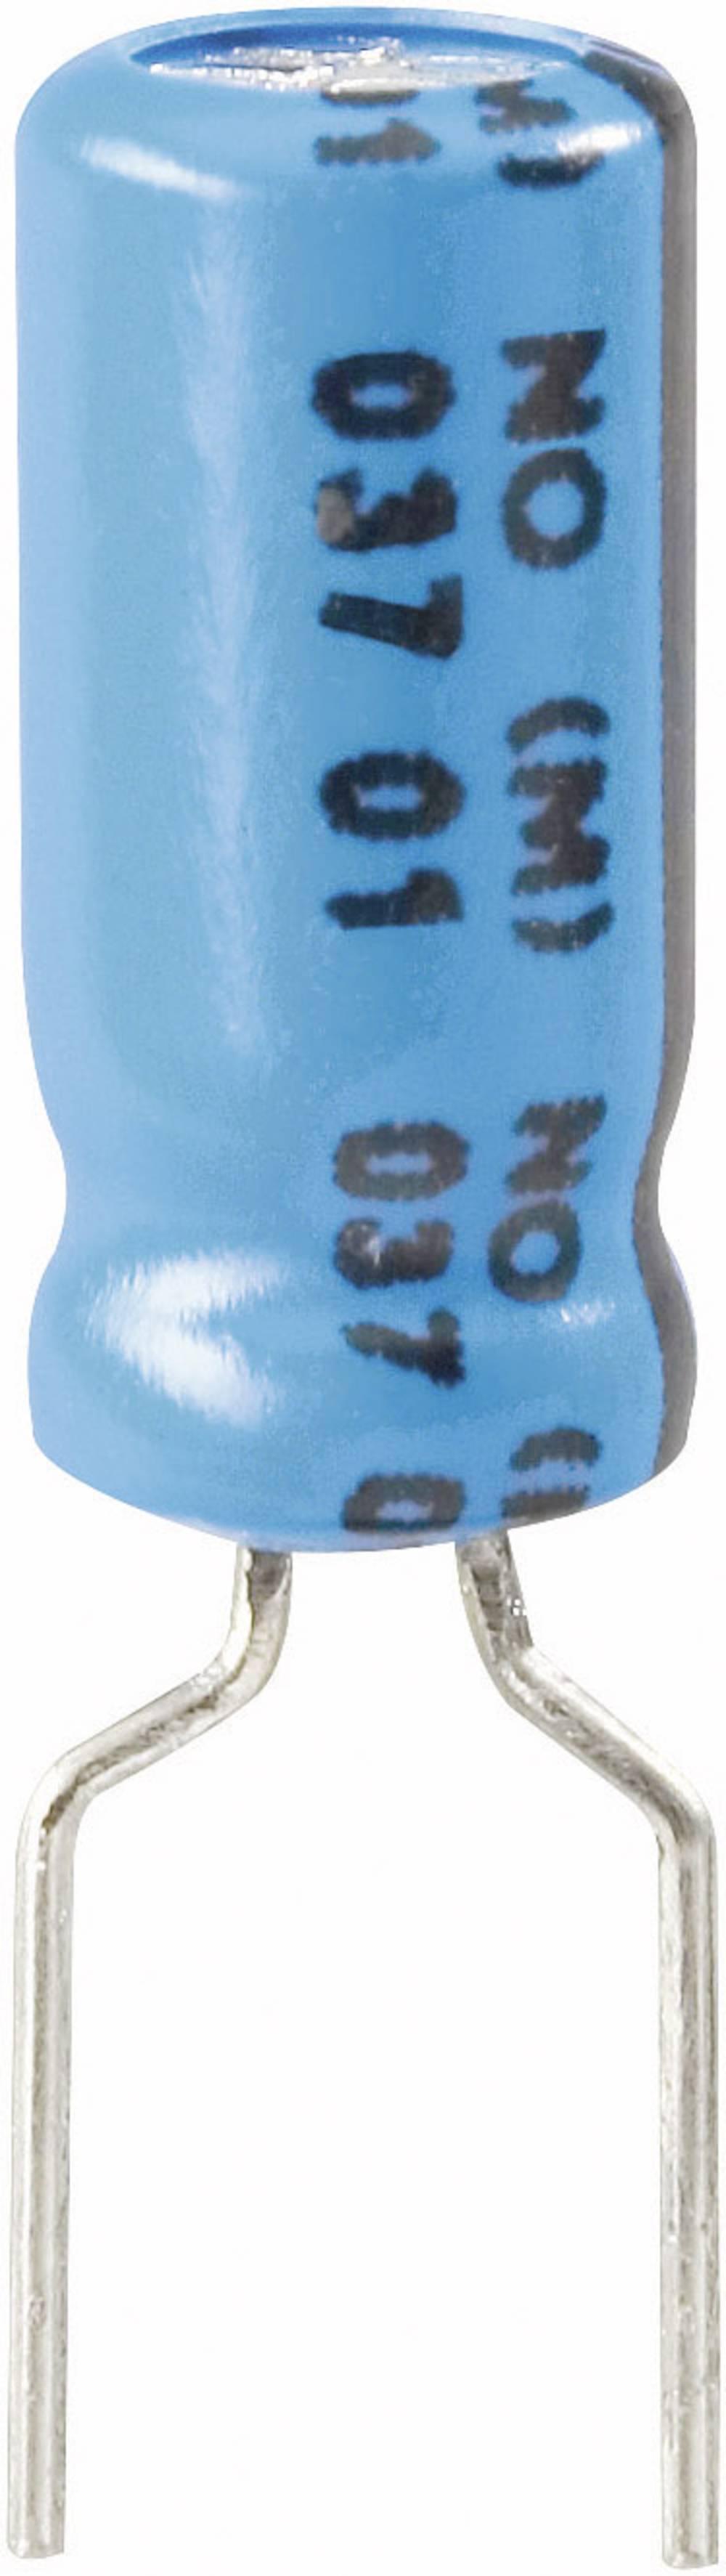 Vishay standardni elektrol.kondenz. (OxV) 13mm x 25mm raster7.5mm 2222 037 36222